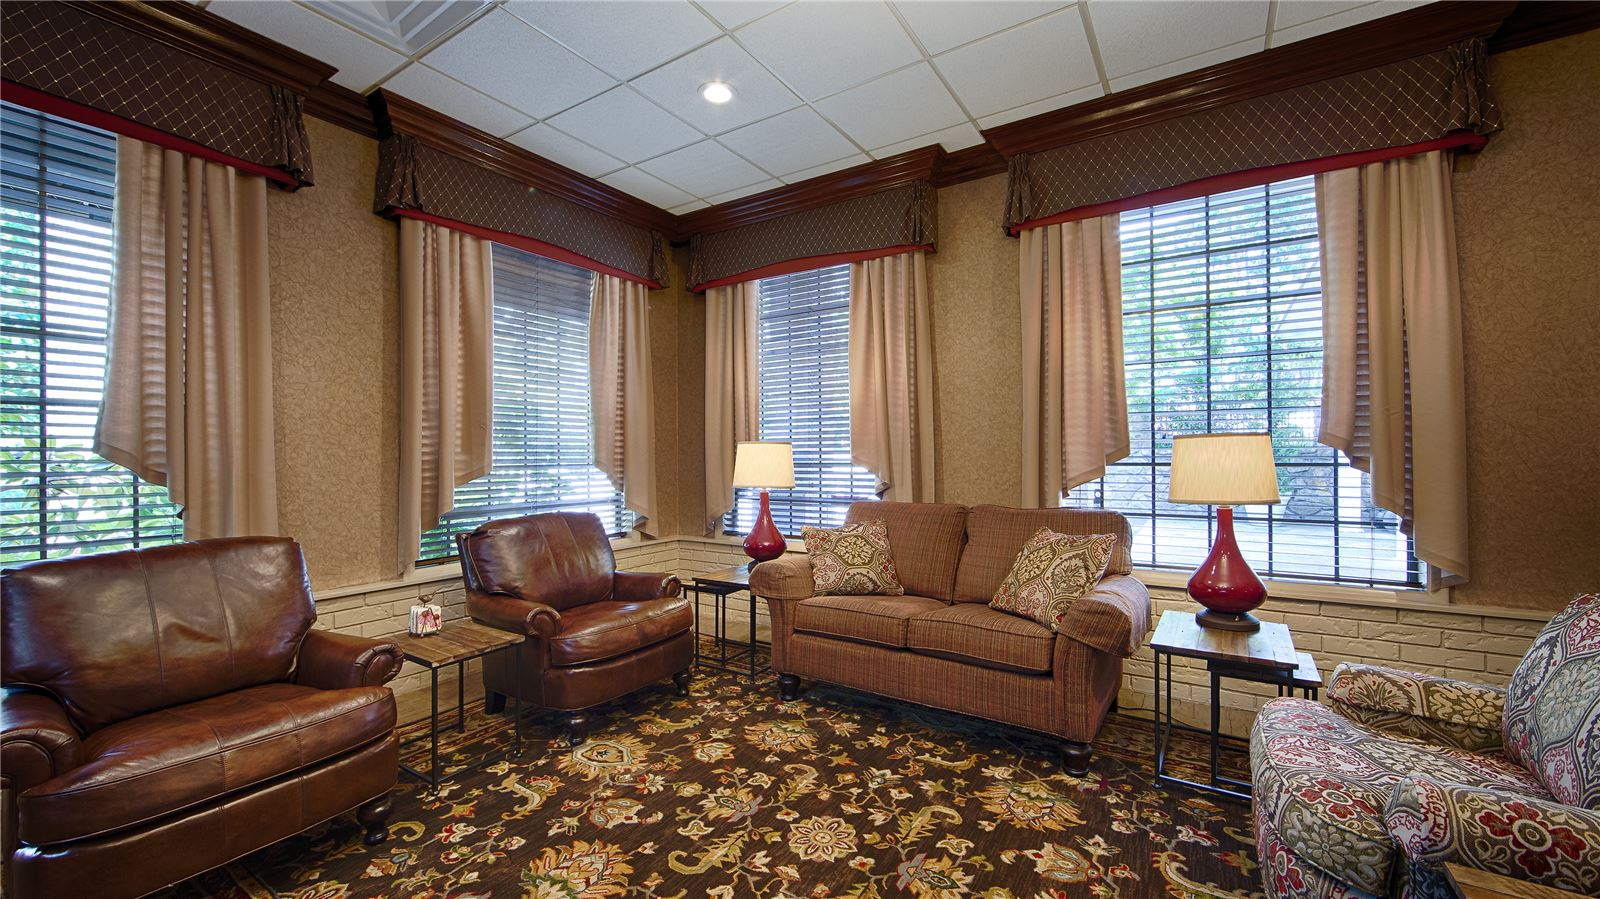 eureka springs ar hotel photos best western inn of the. Black Bedroom Furniture Sets. Home Design Ideas